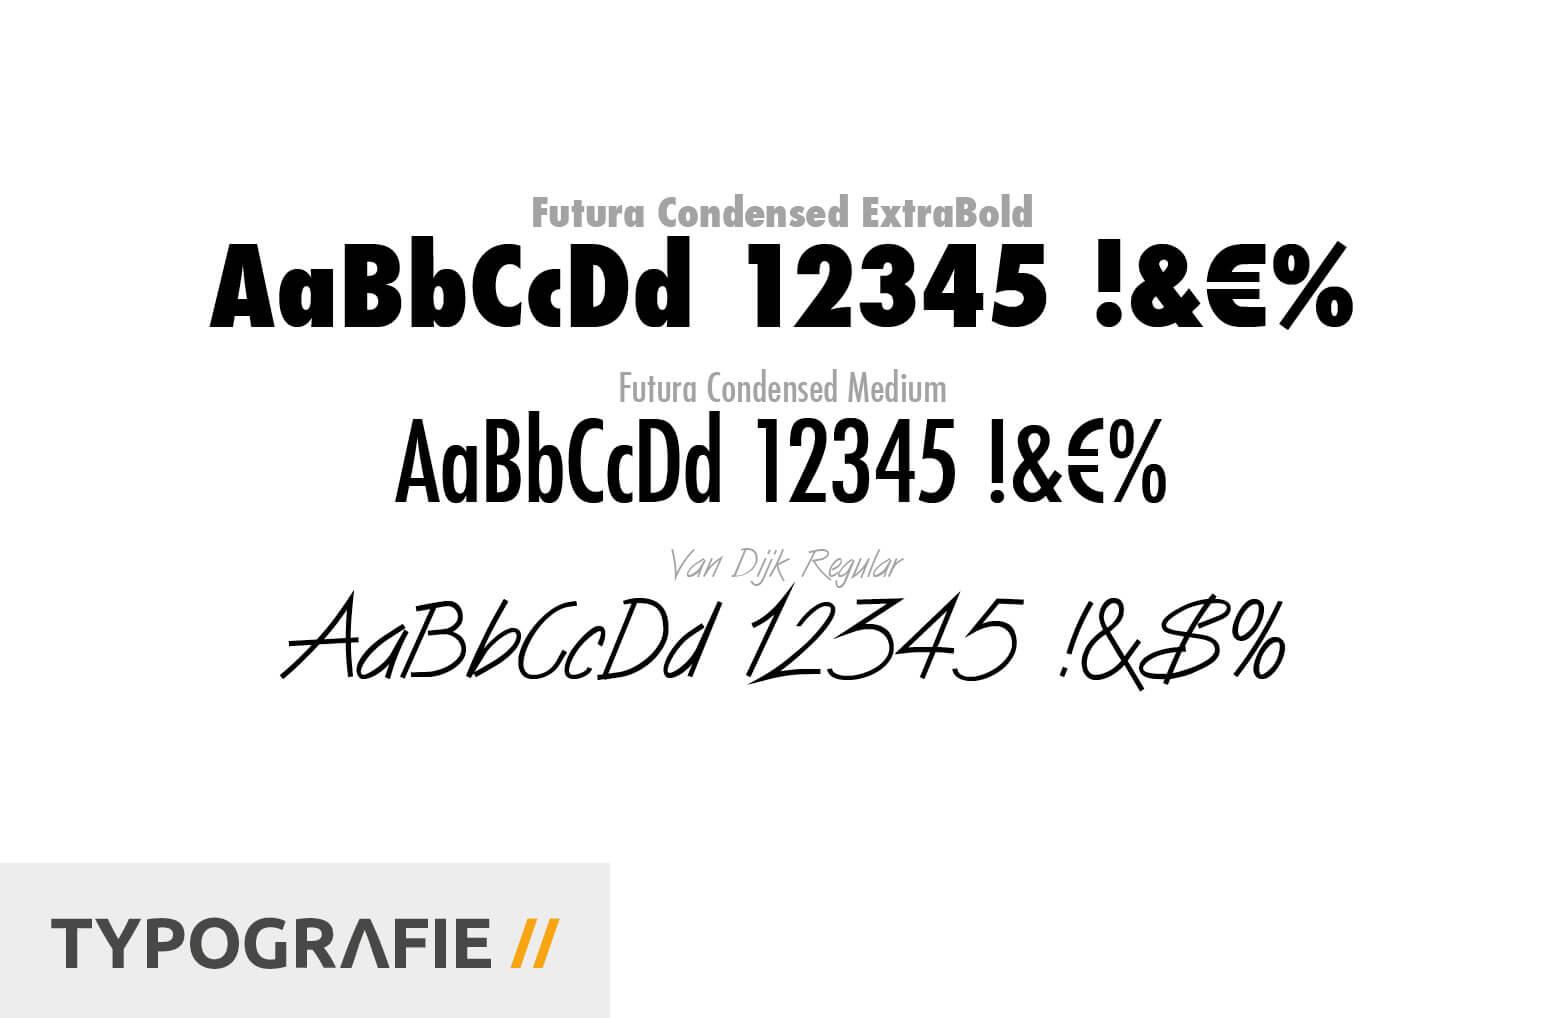 uhl_relaunch_1565x1018_alt_3